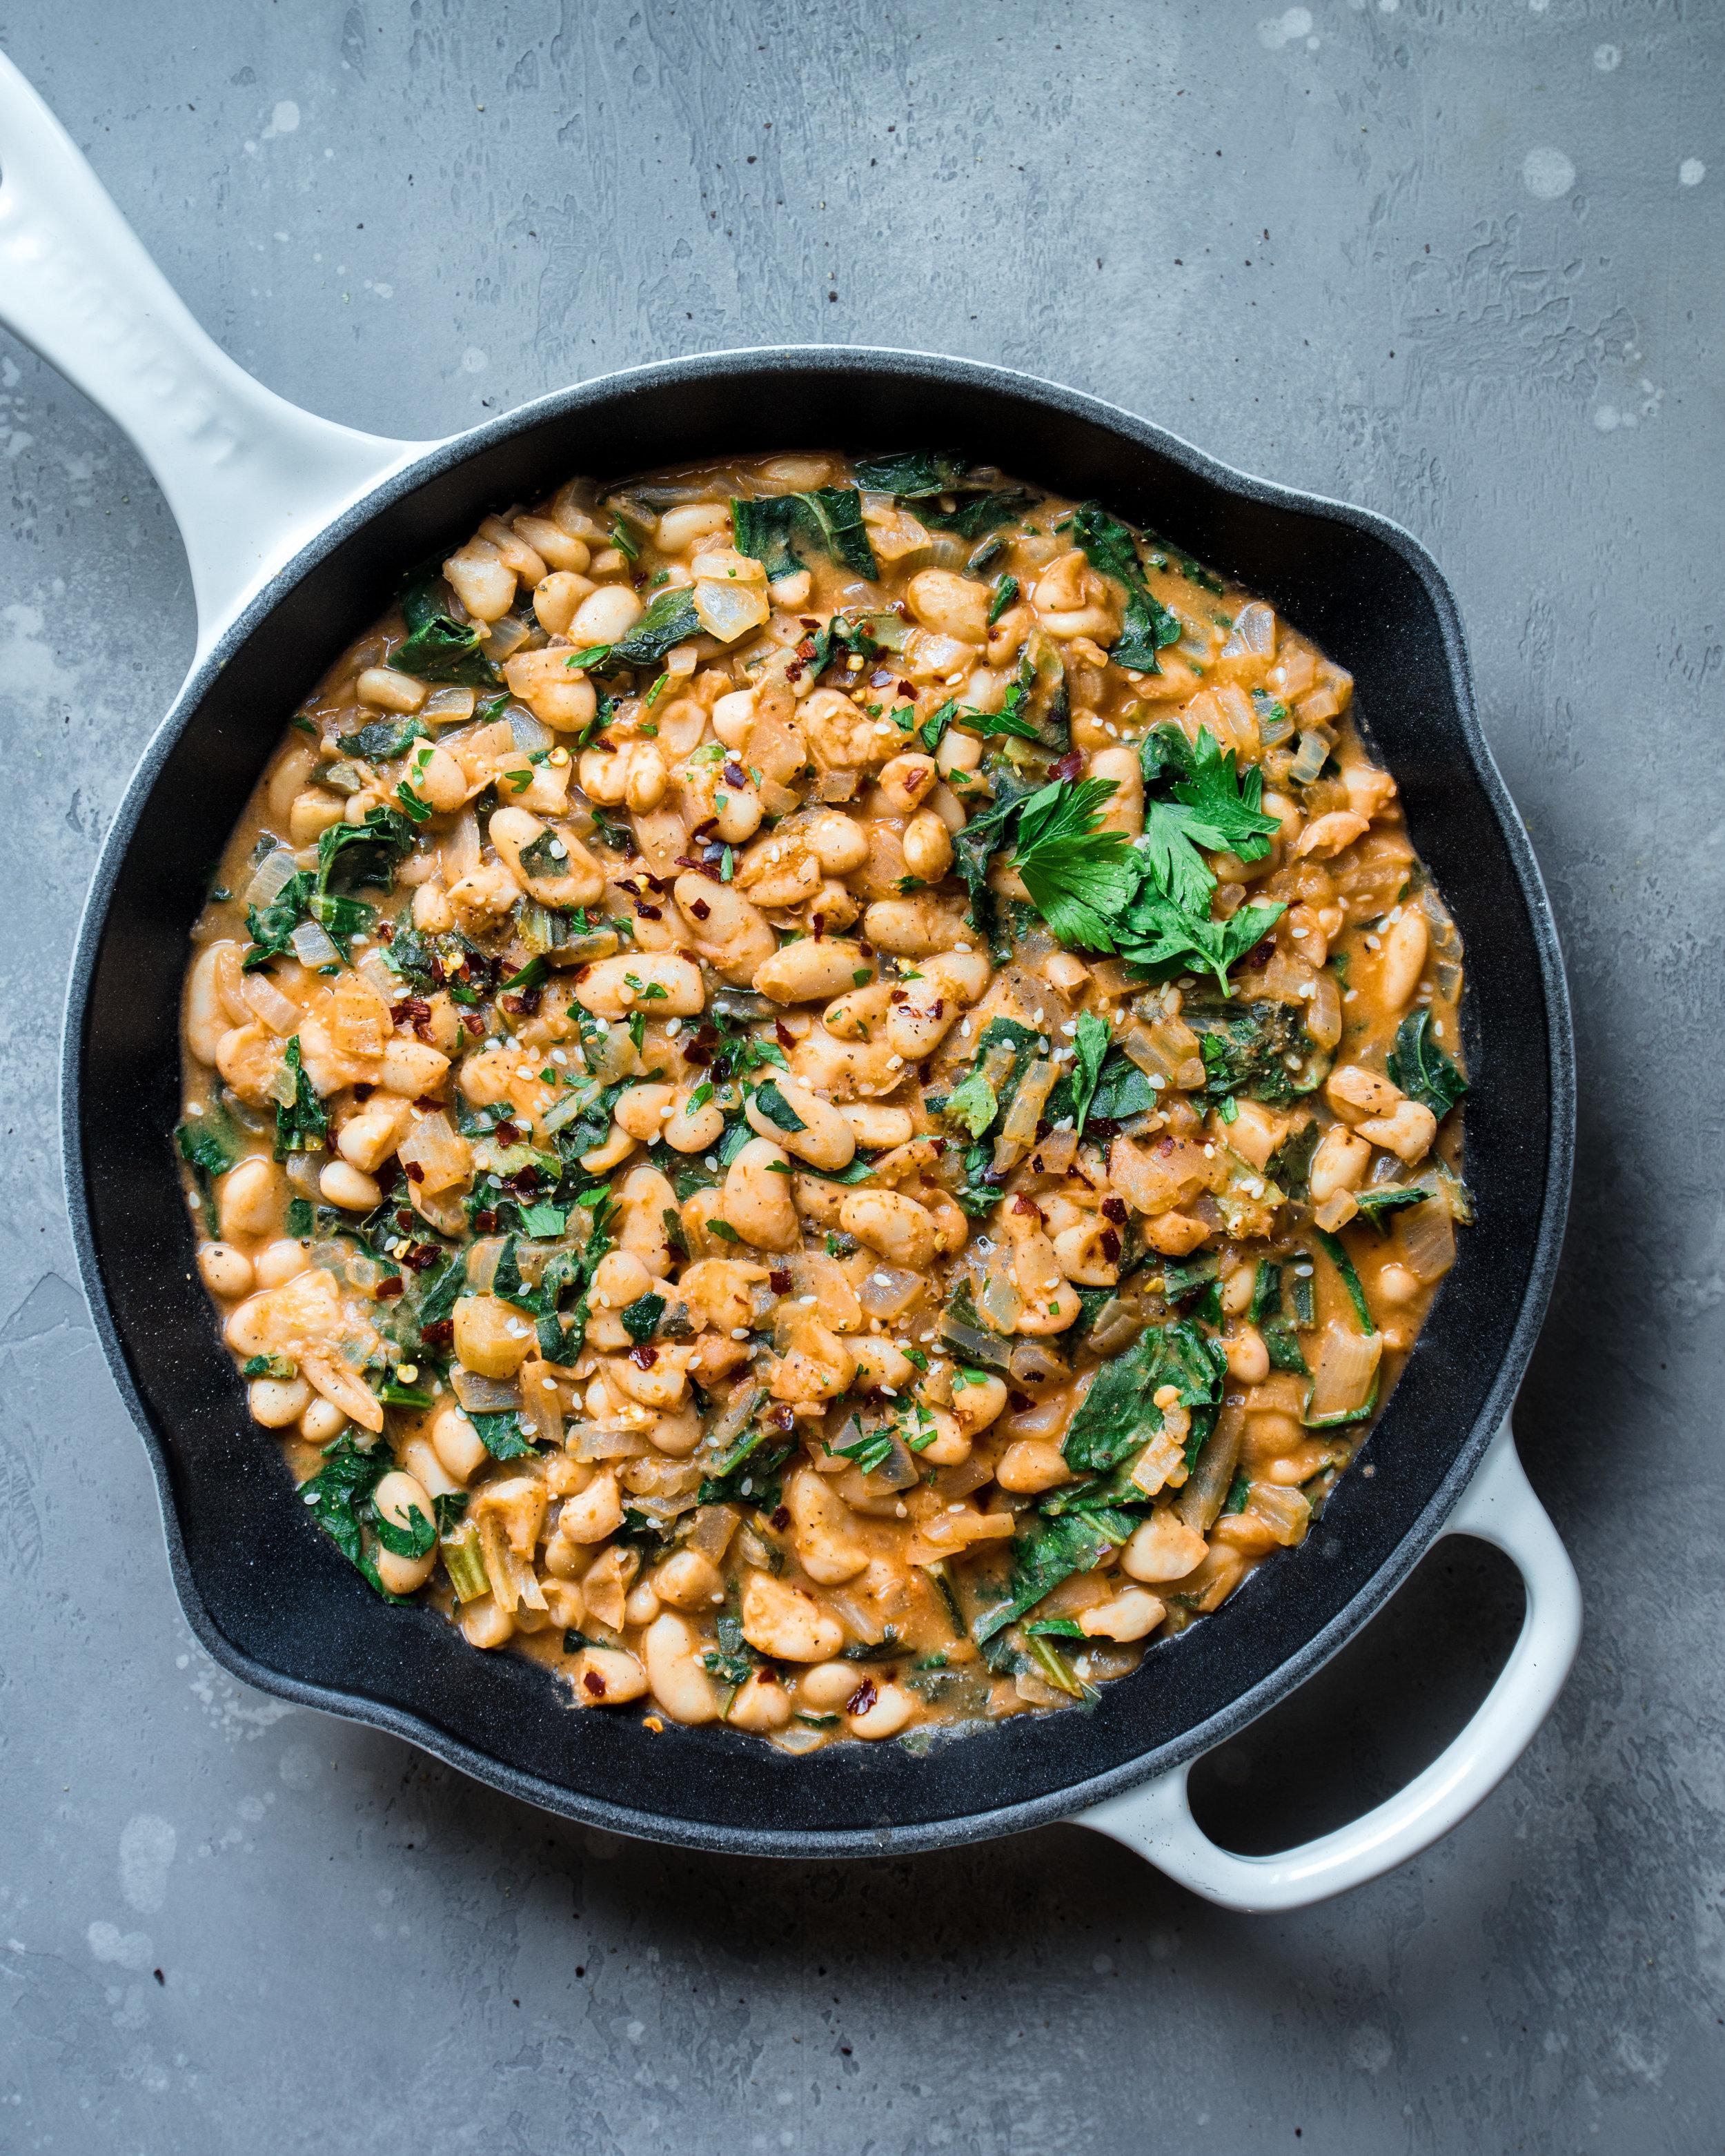 5-Ingredient Vegan Recipes, Creamy White Beans and Kale